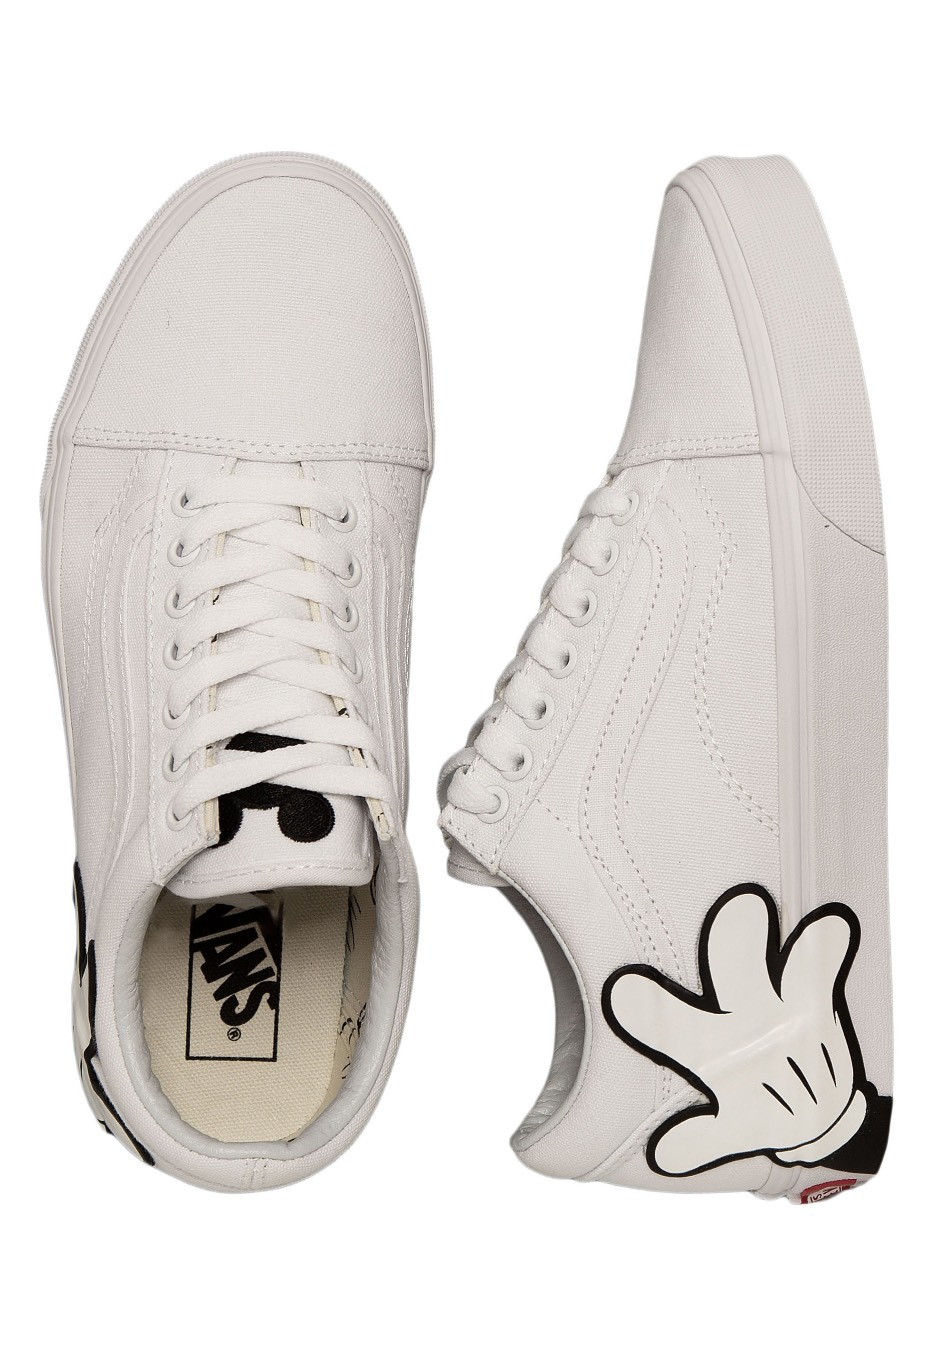 vans disney femme chaussure